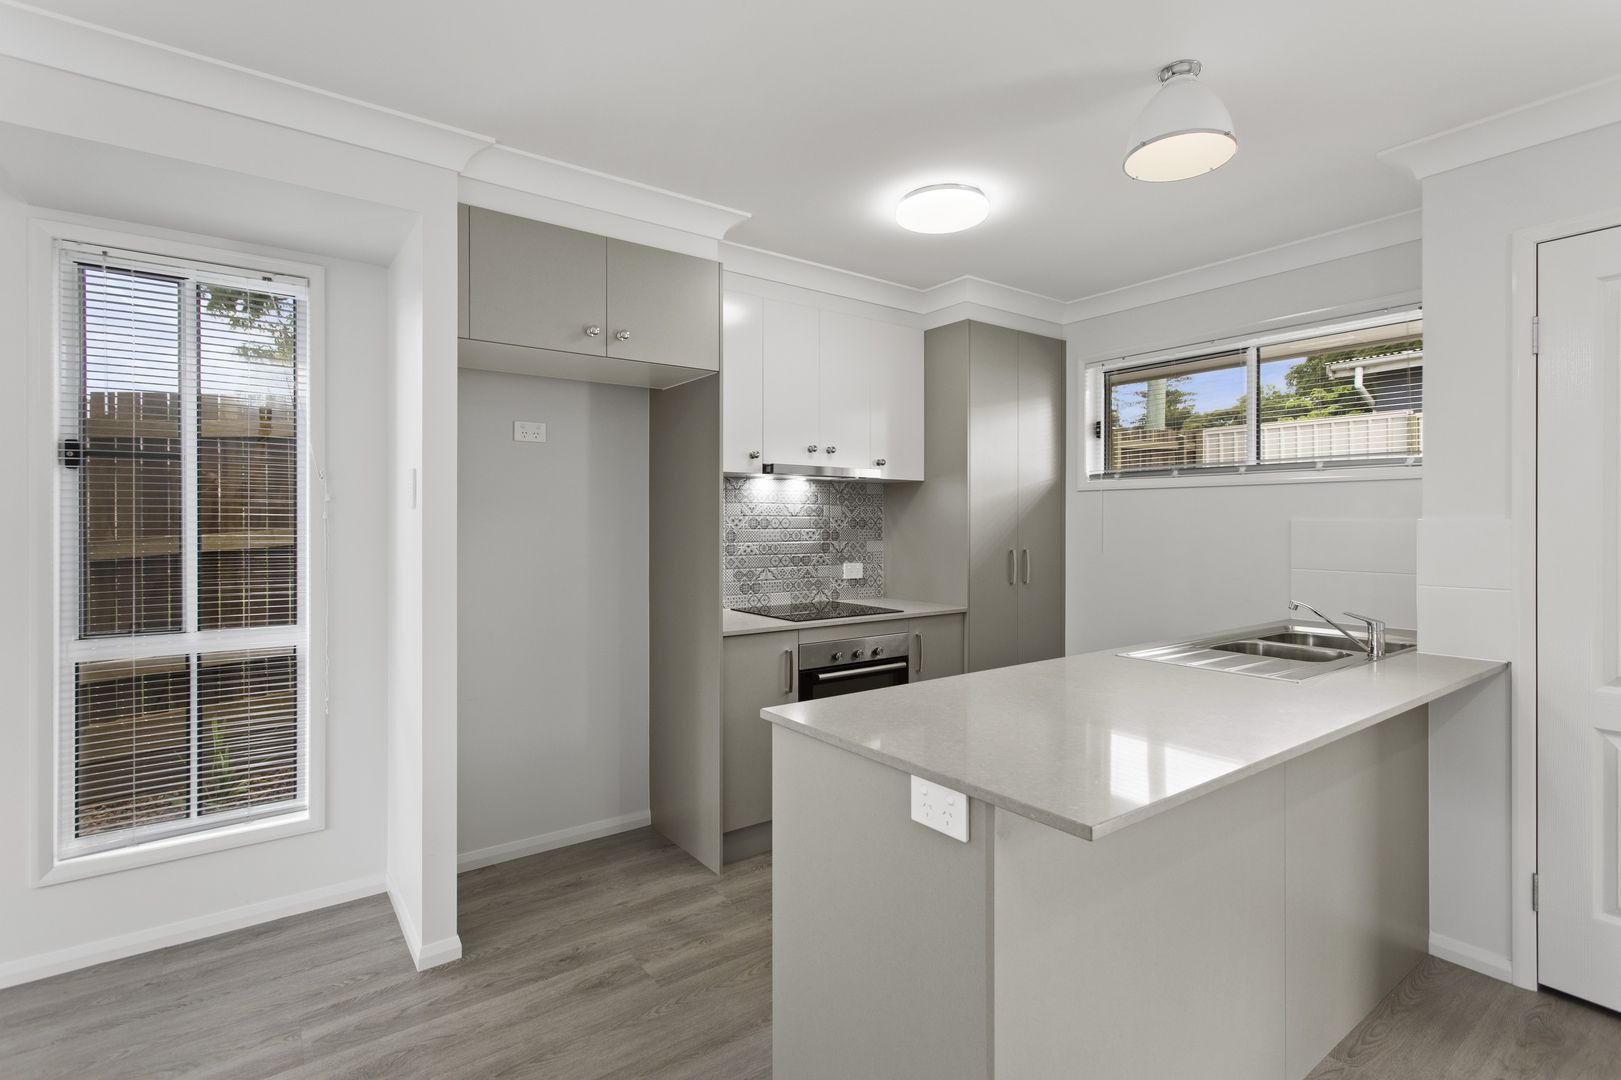 4/24 Cranley Street, South Toowoomba QLD 4350, Image 2